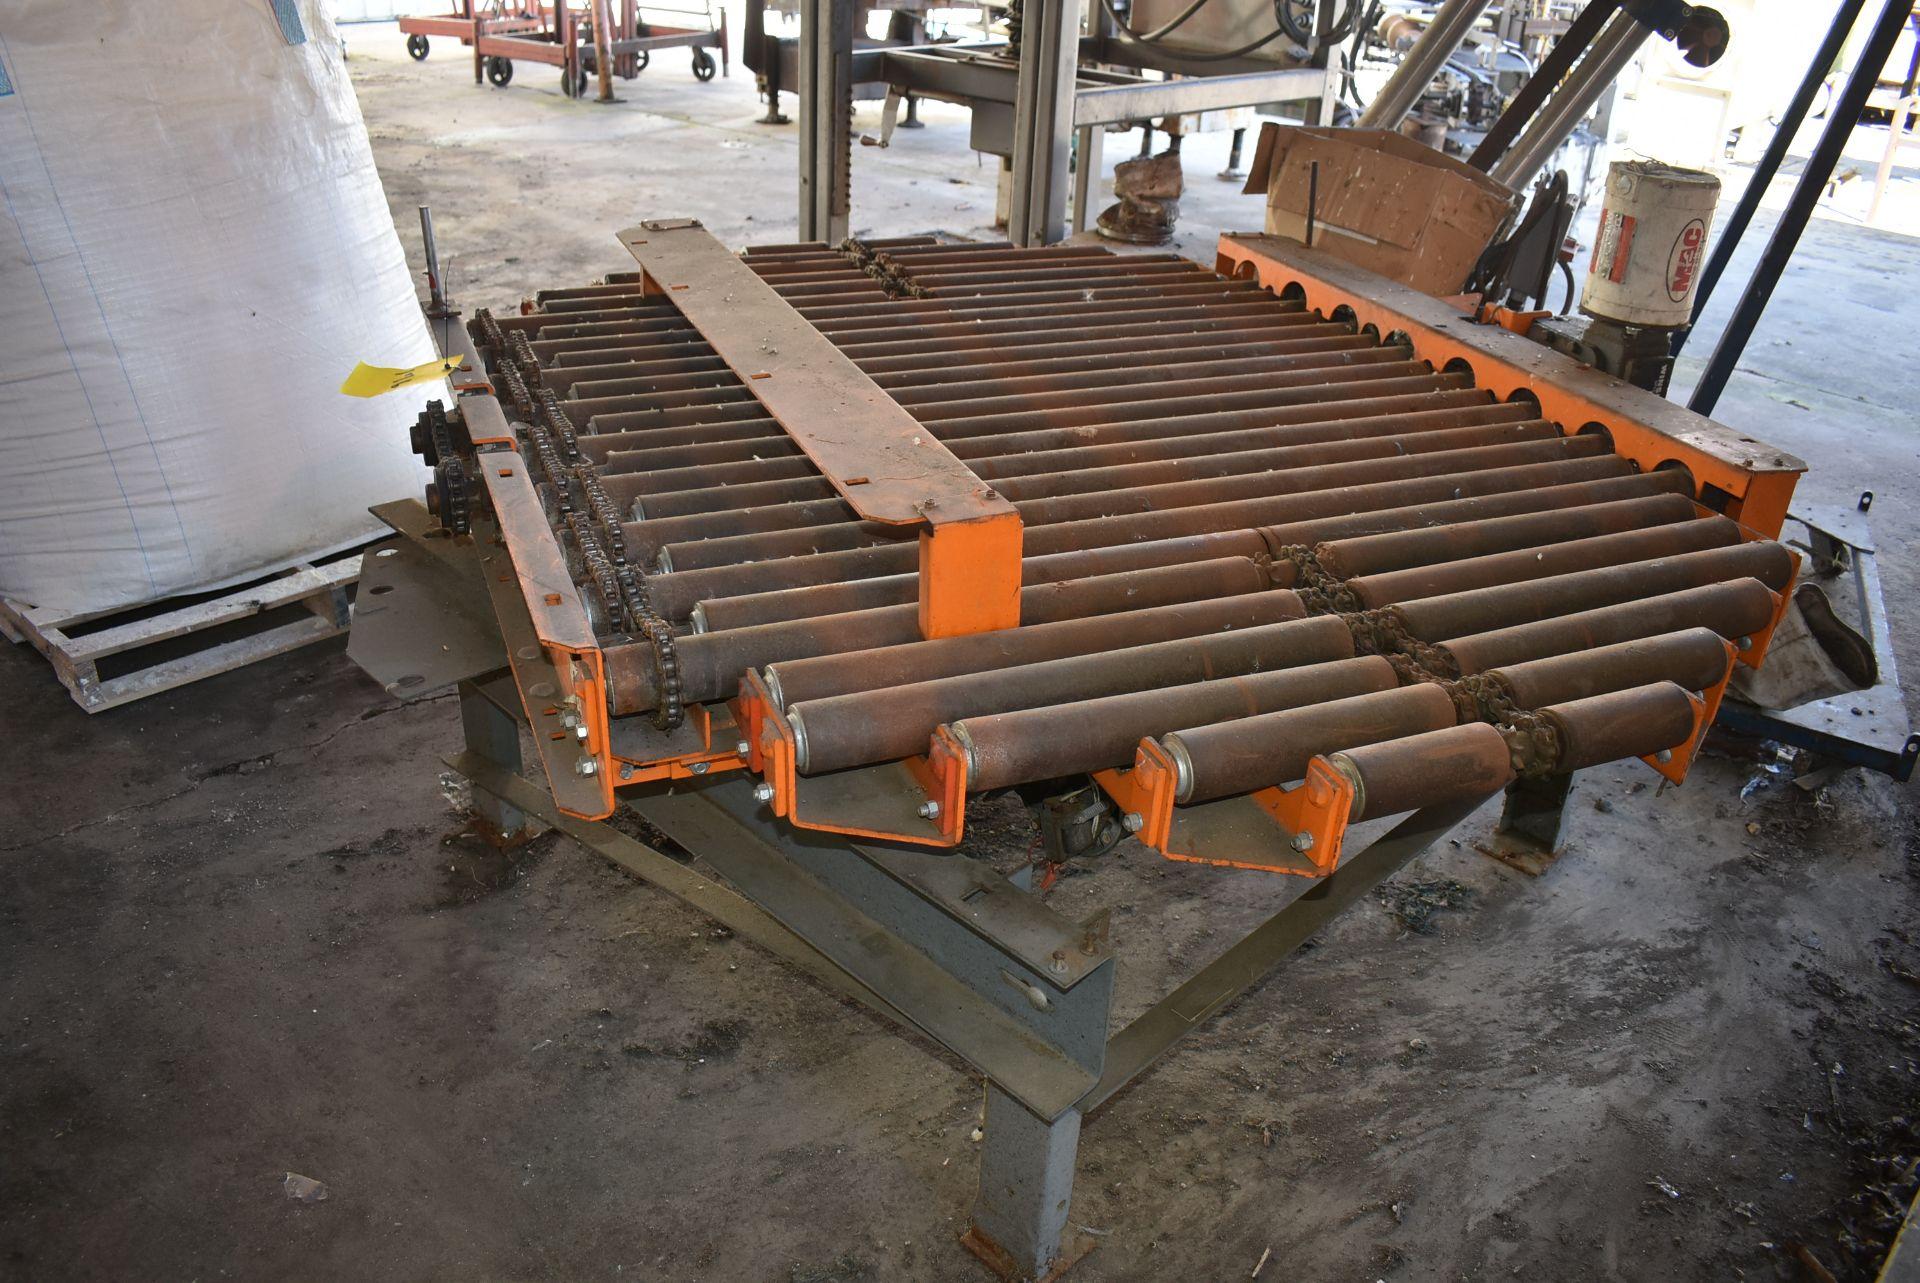 "Motorized HD Roller Conveyor, 72"" x 54"" Rollers, Steel Base - Image 2 of 2"